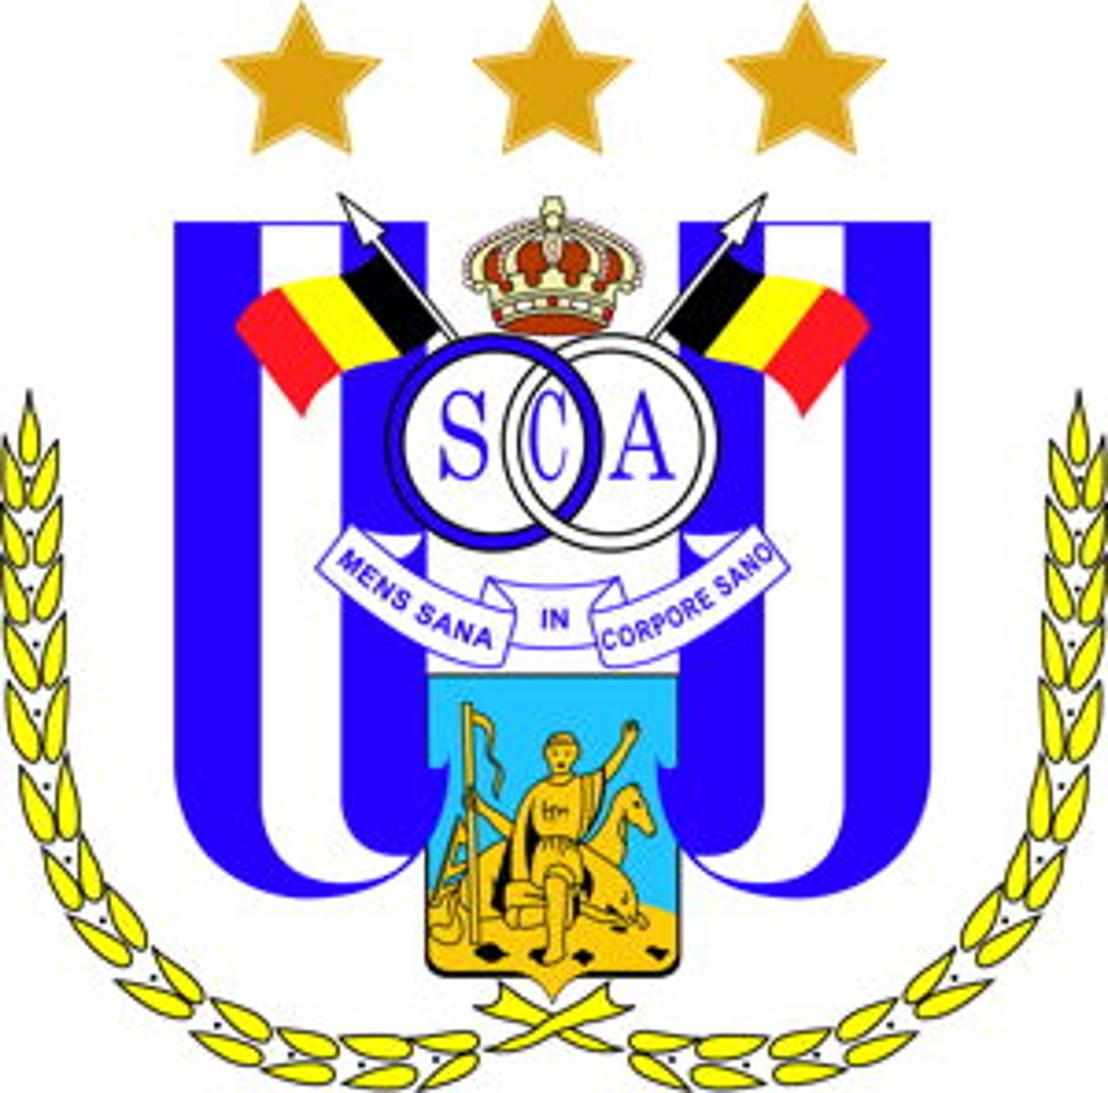 Conférence de presse concernant le match STVV-RSCA